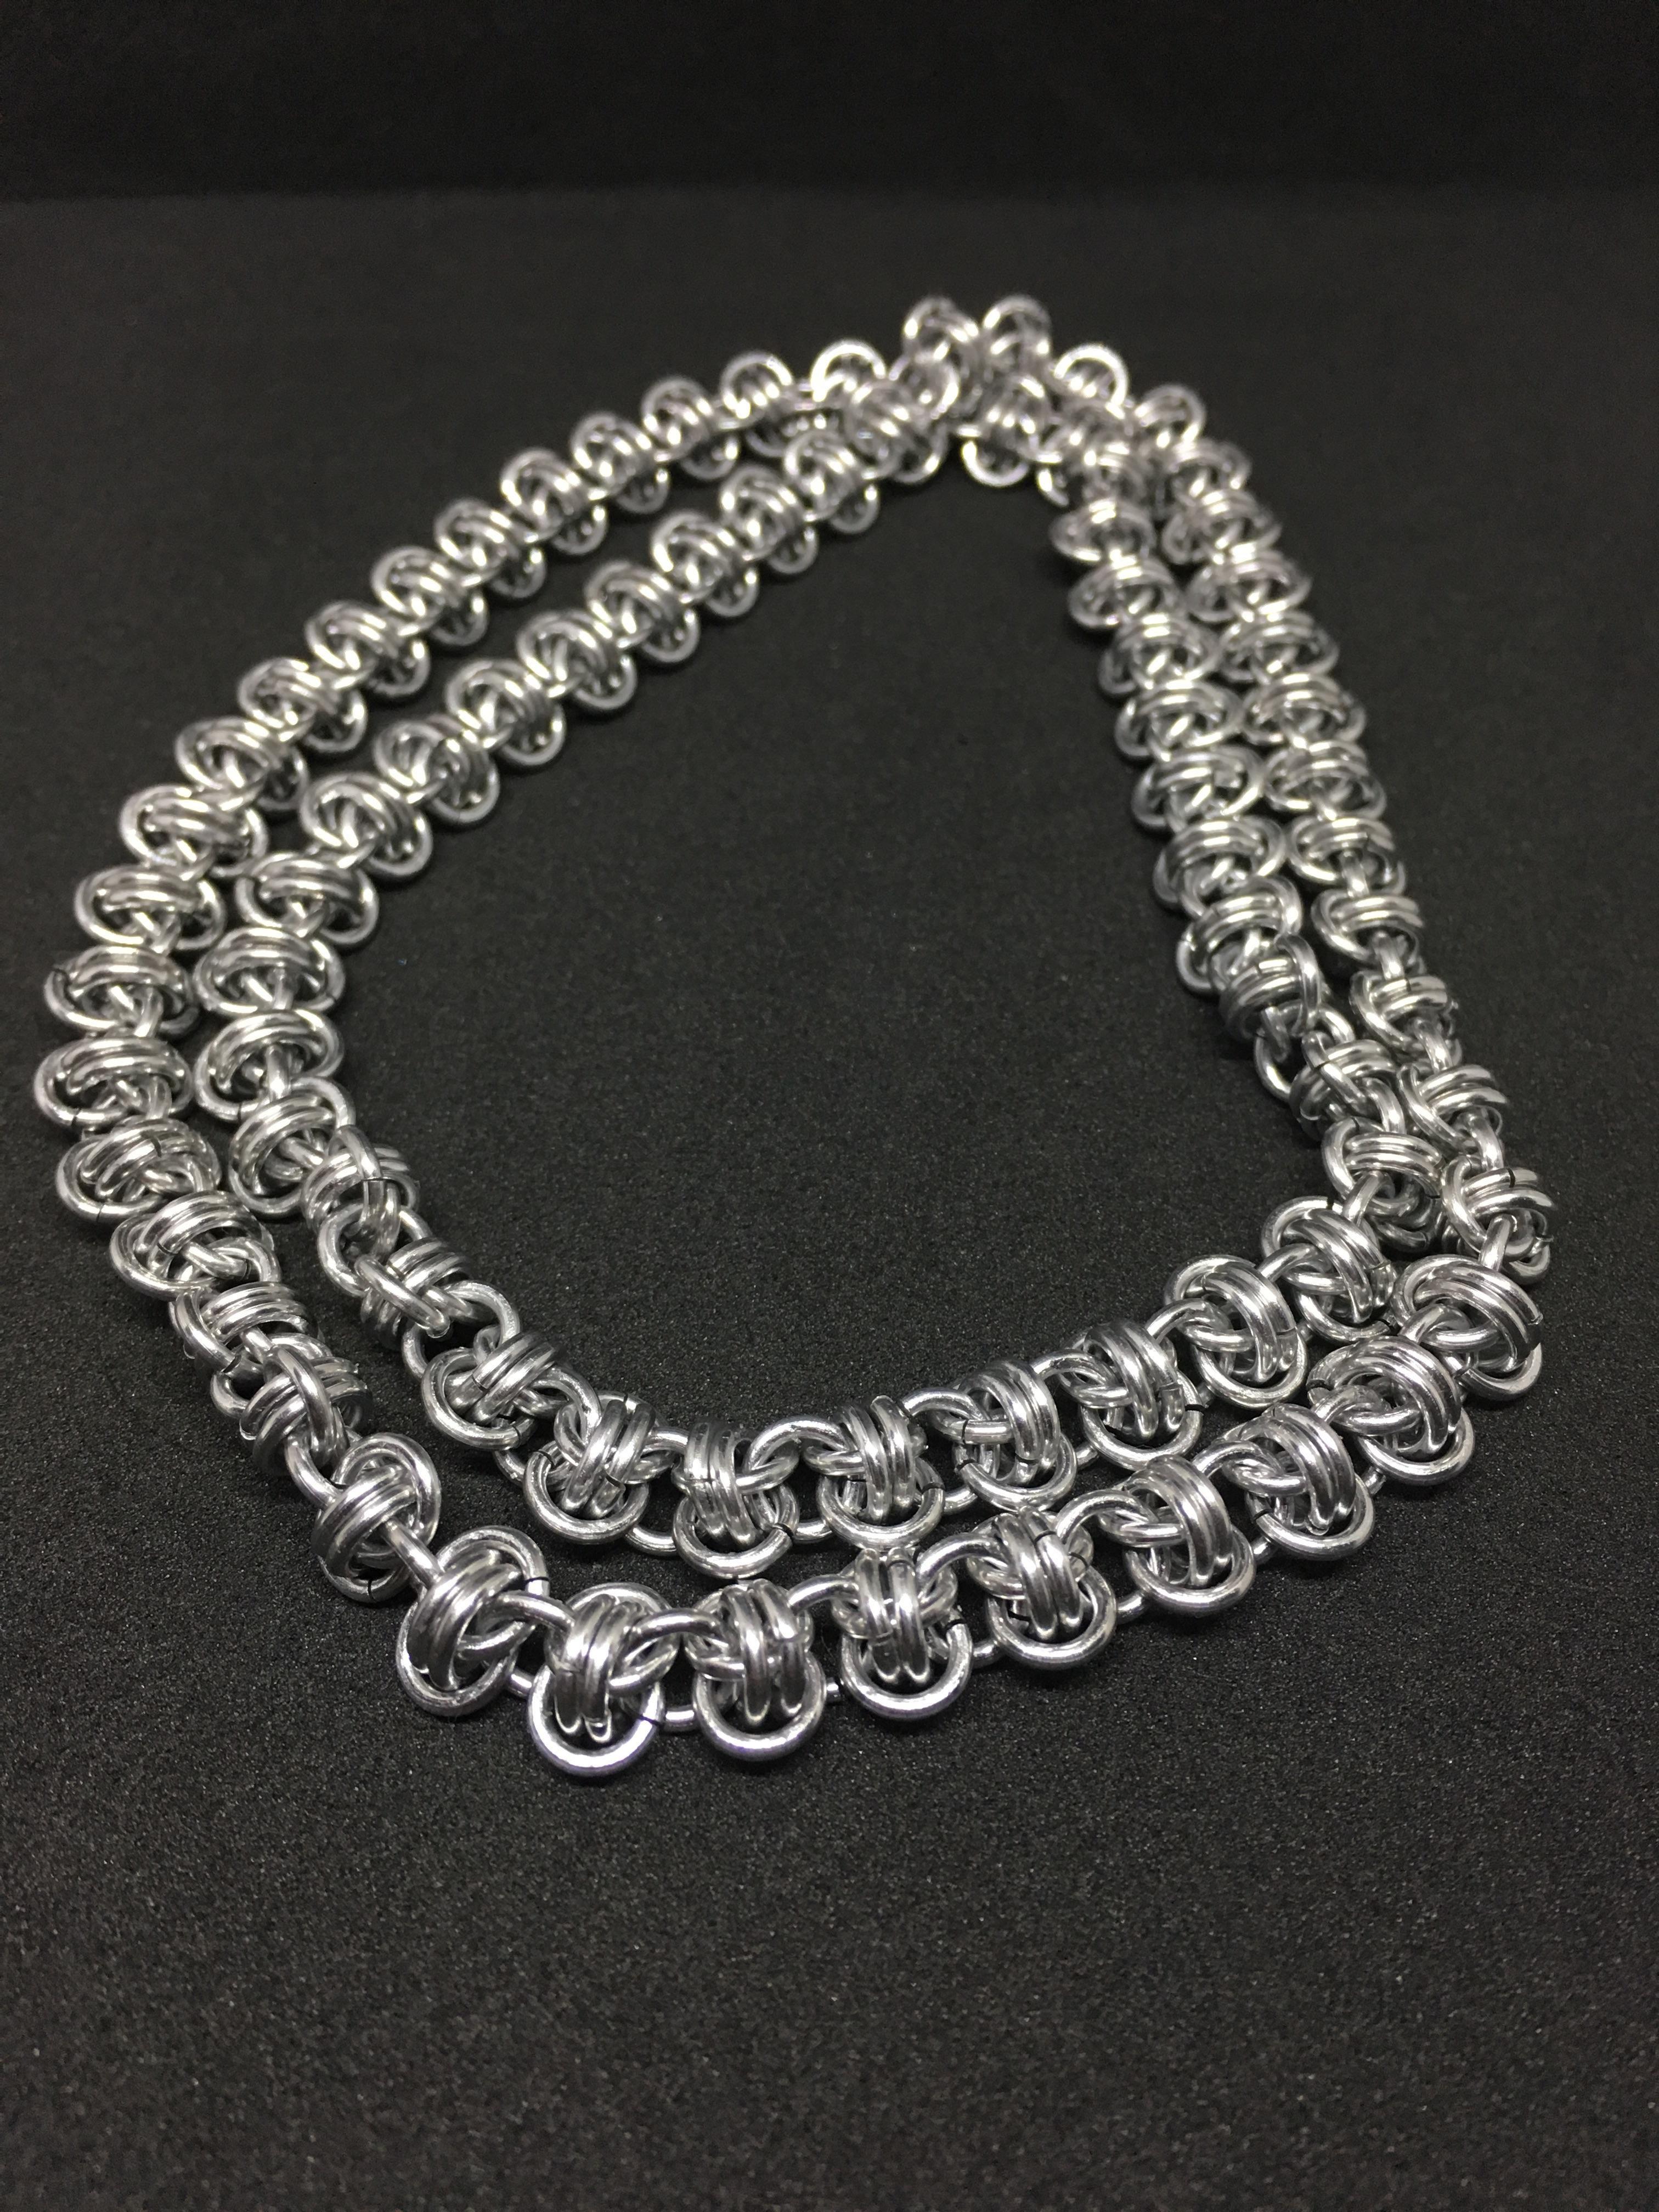 silver jewelry making kit